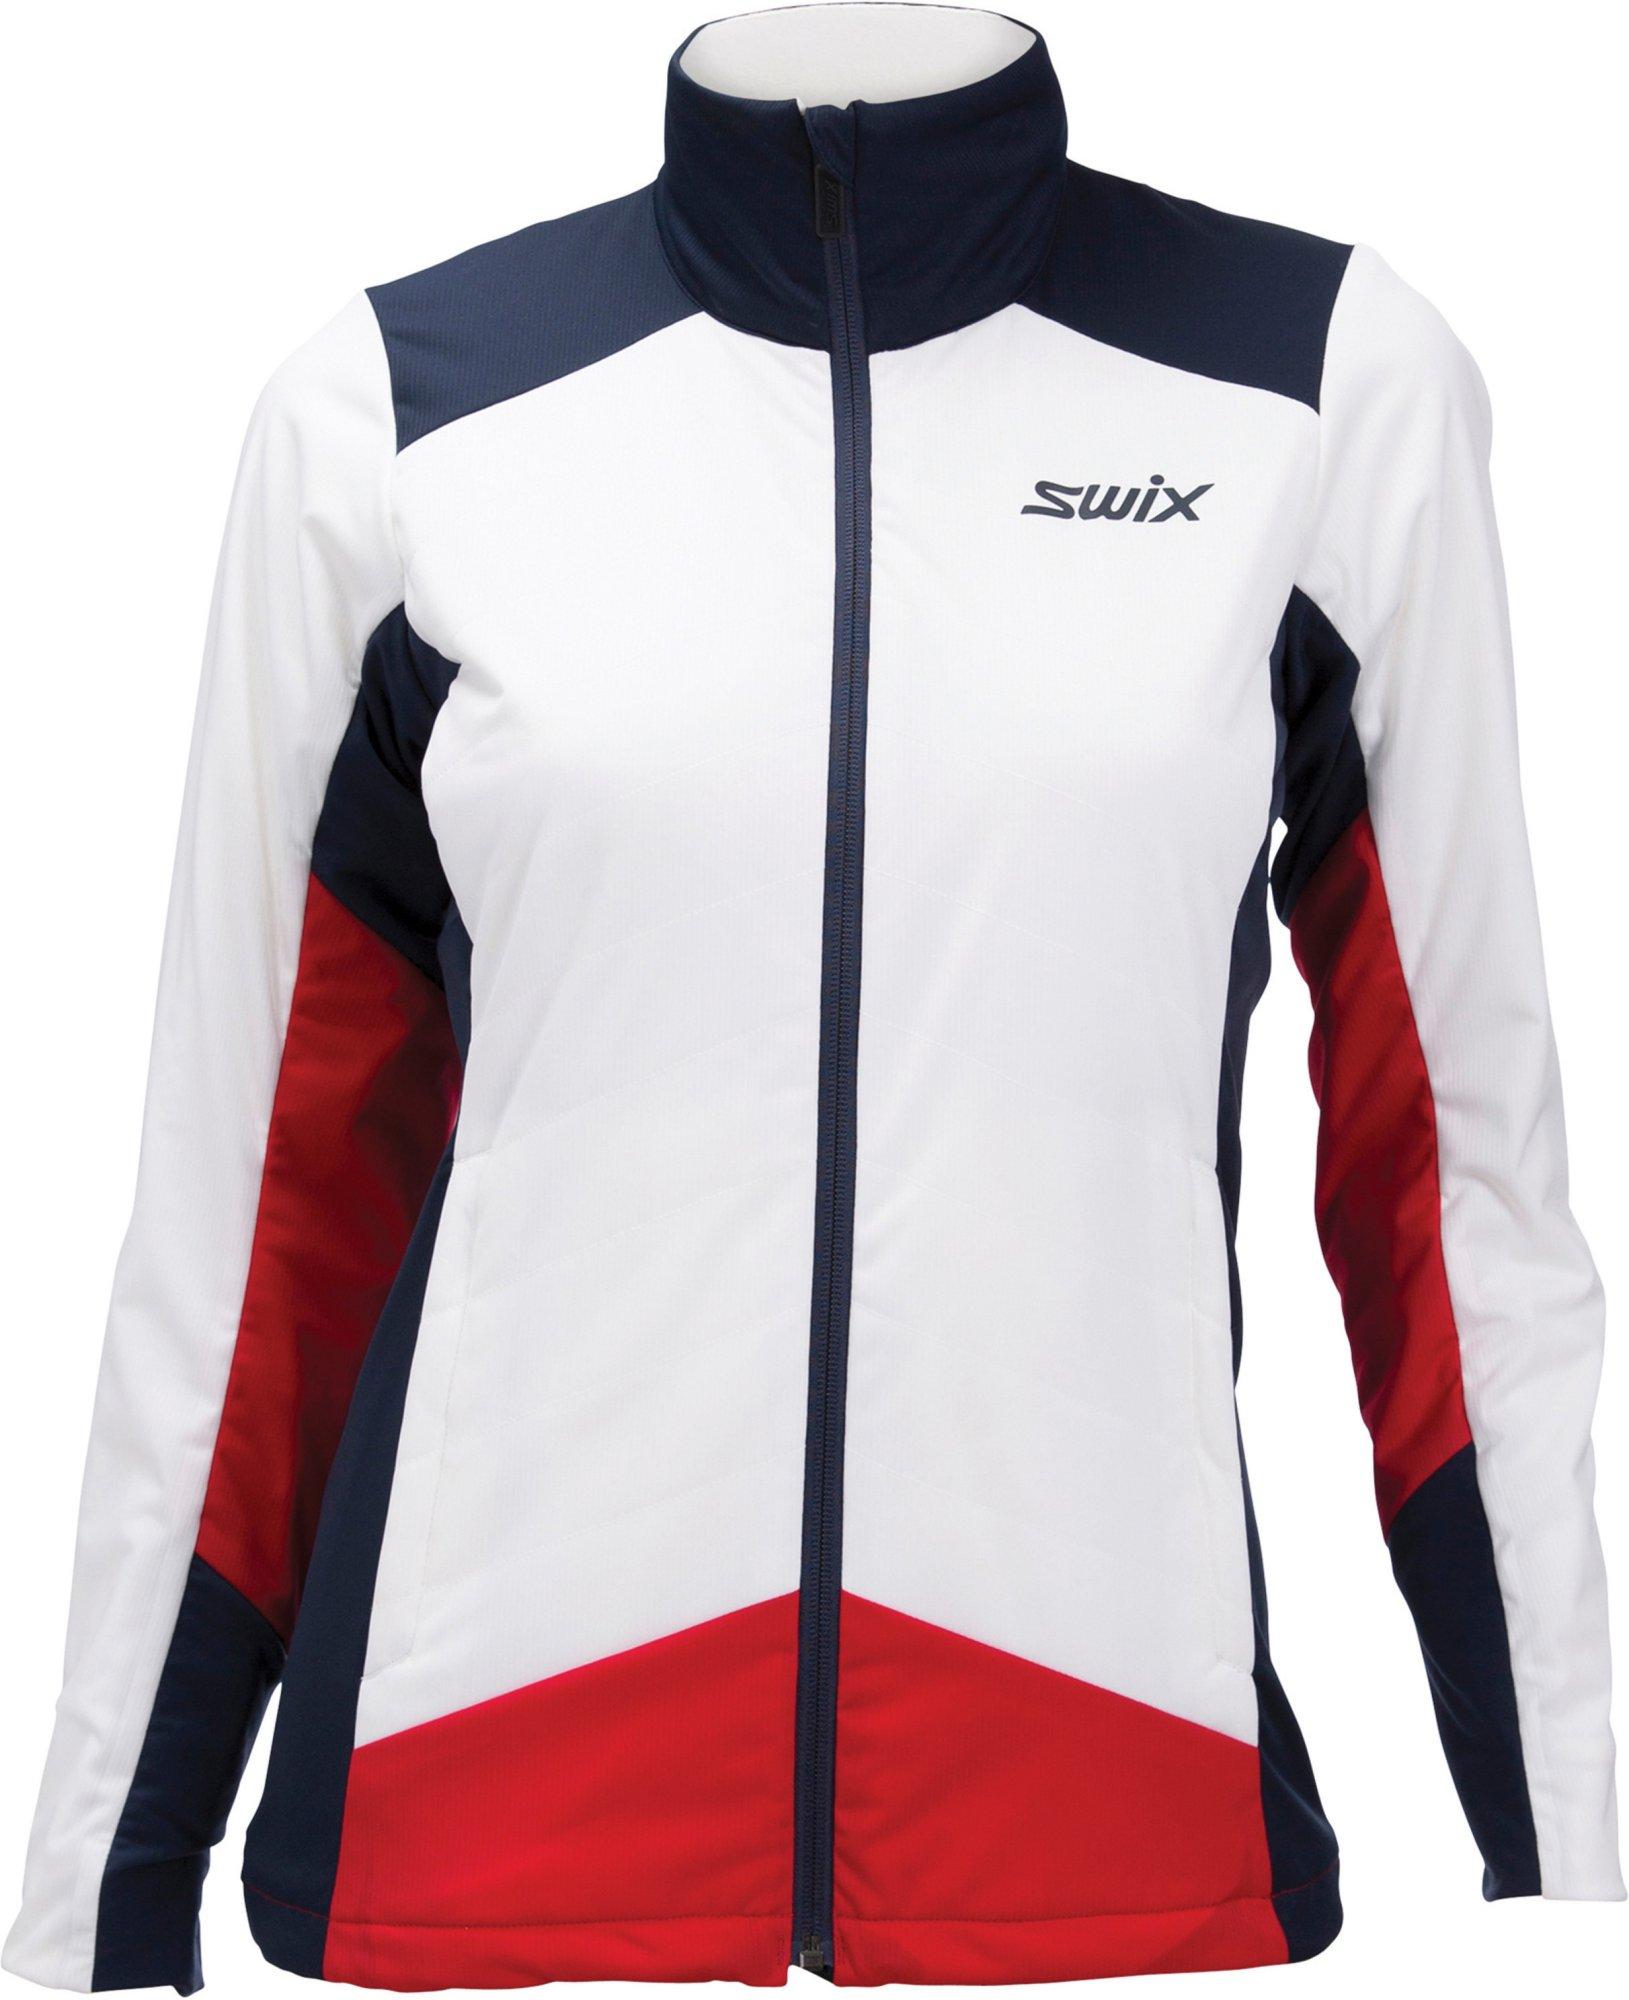 Dynamic jakke + bukse, dame   Bull Ski & Kajakk AS